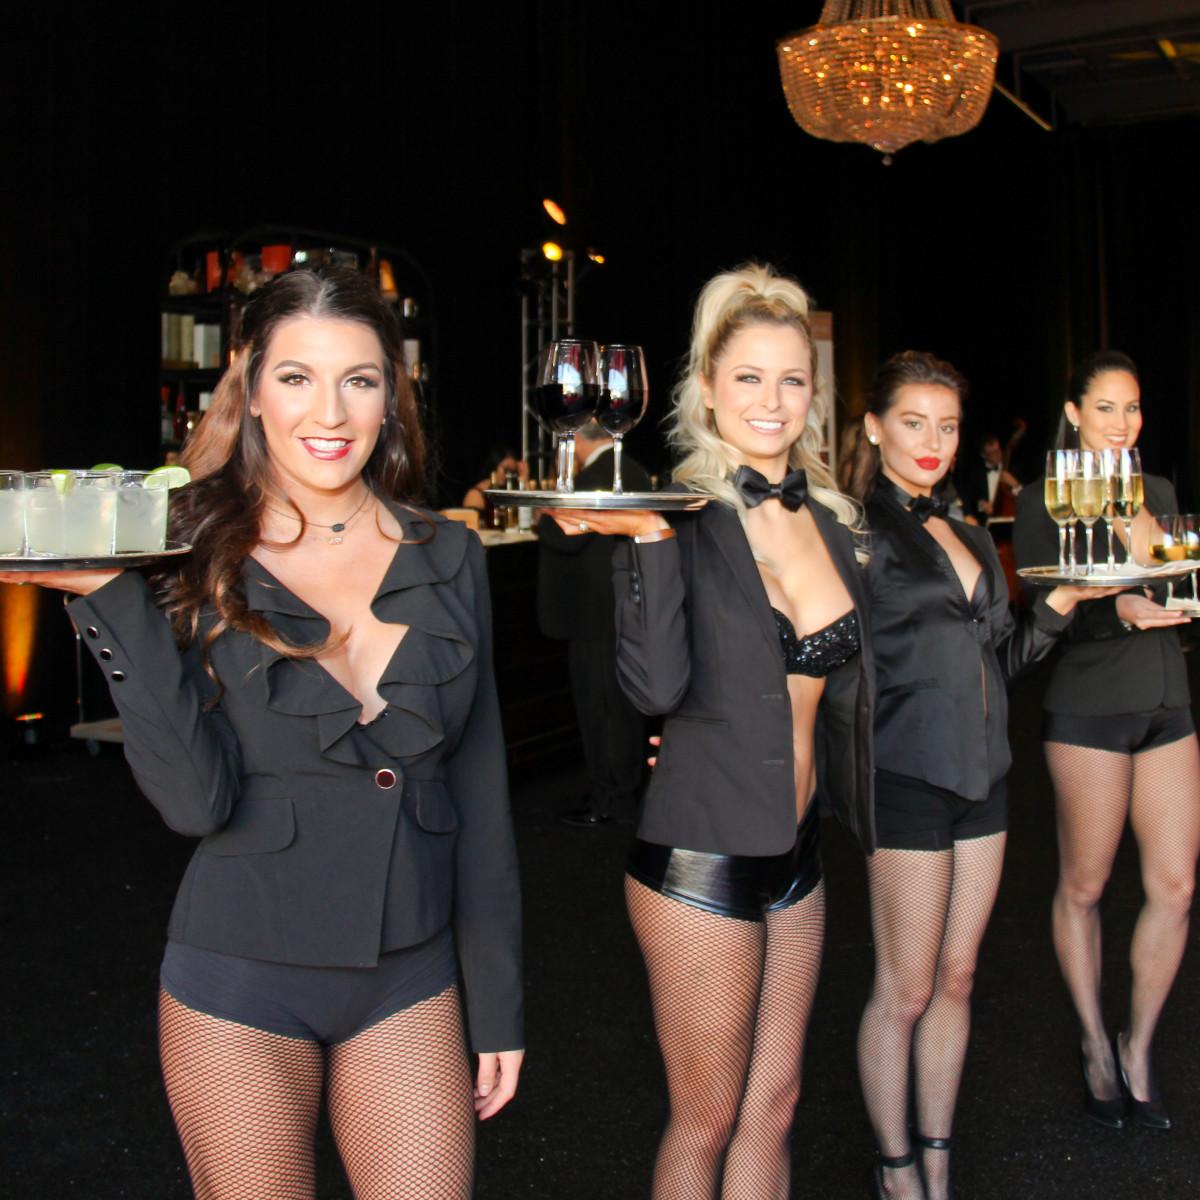 Houston, Black Tie Boxing Benefiting Lone Survivor Foundation, Feb 2017, black tie servers